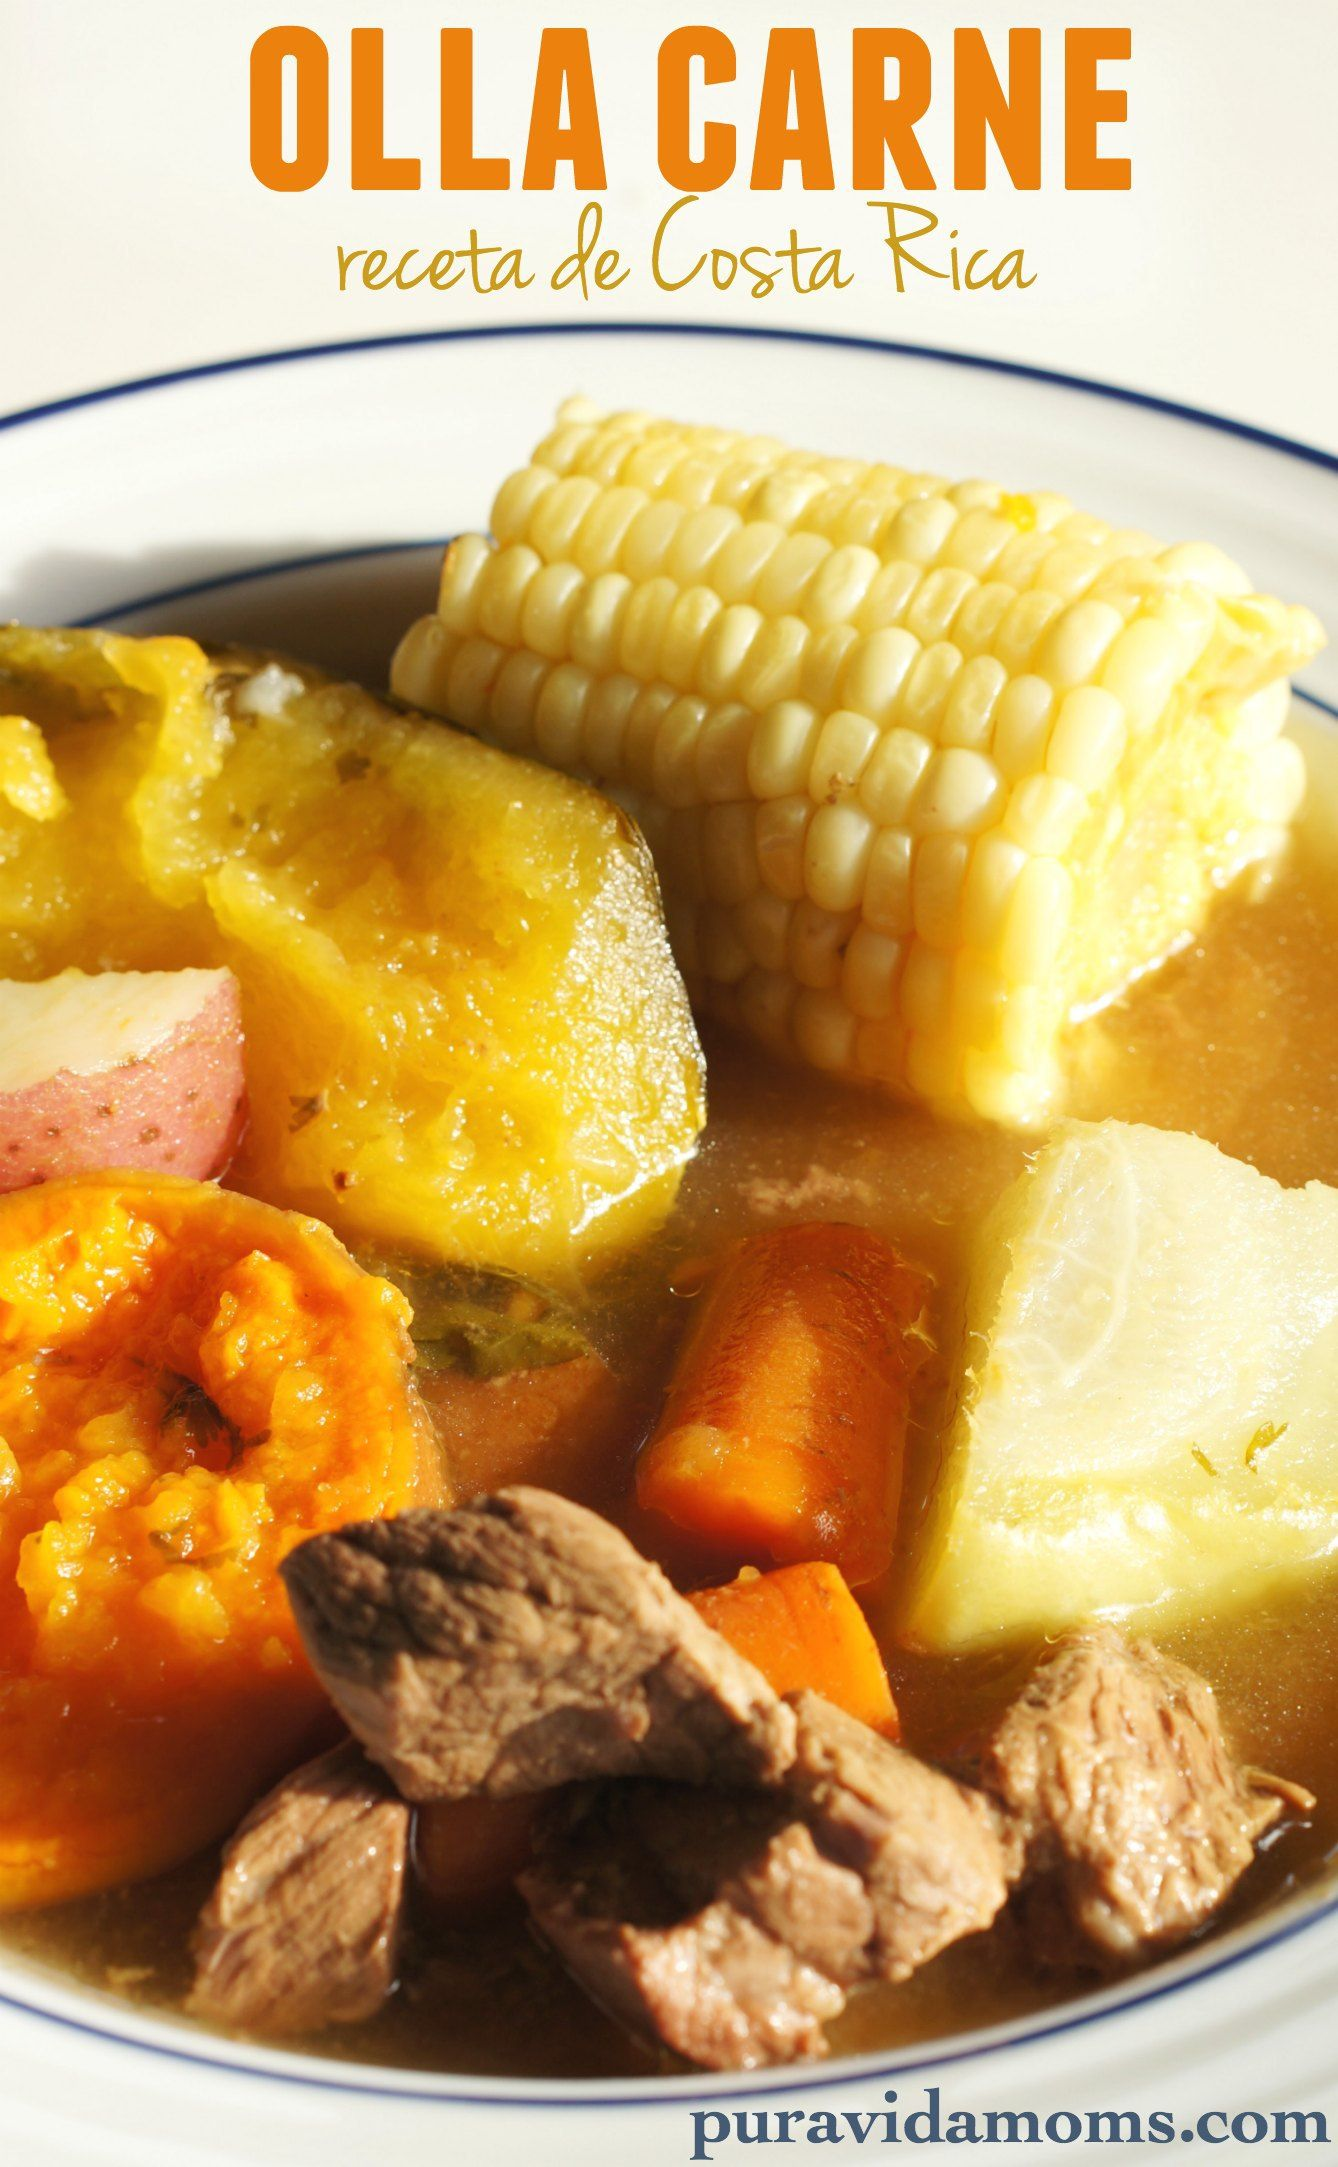 Olla carne receta de costa rica all pinterest costa rica olla carne receta de costa rica forumfinder Choice Image